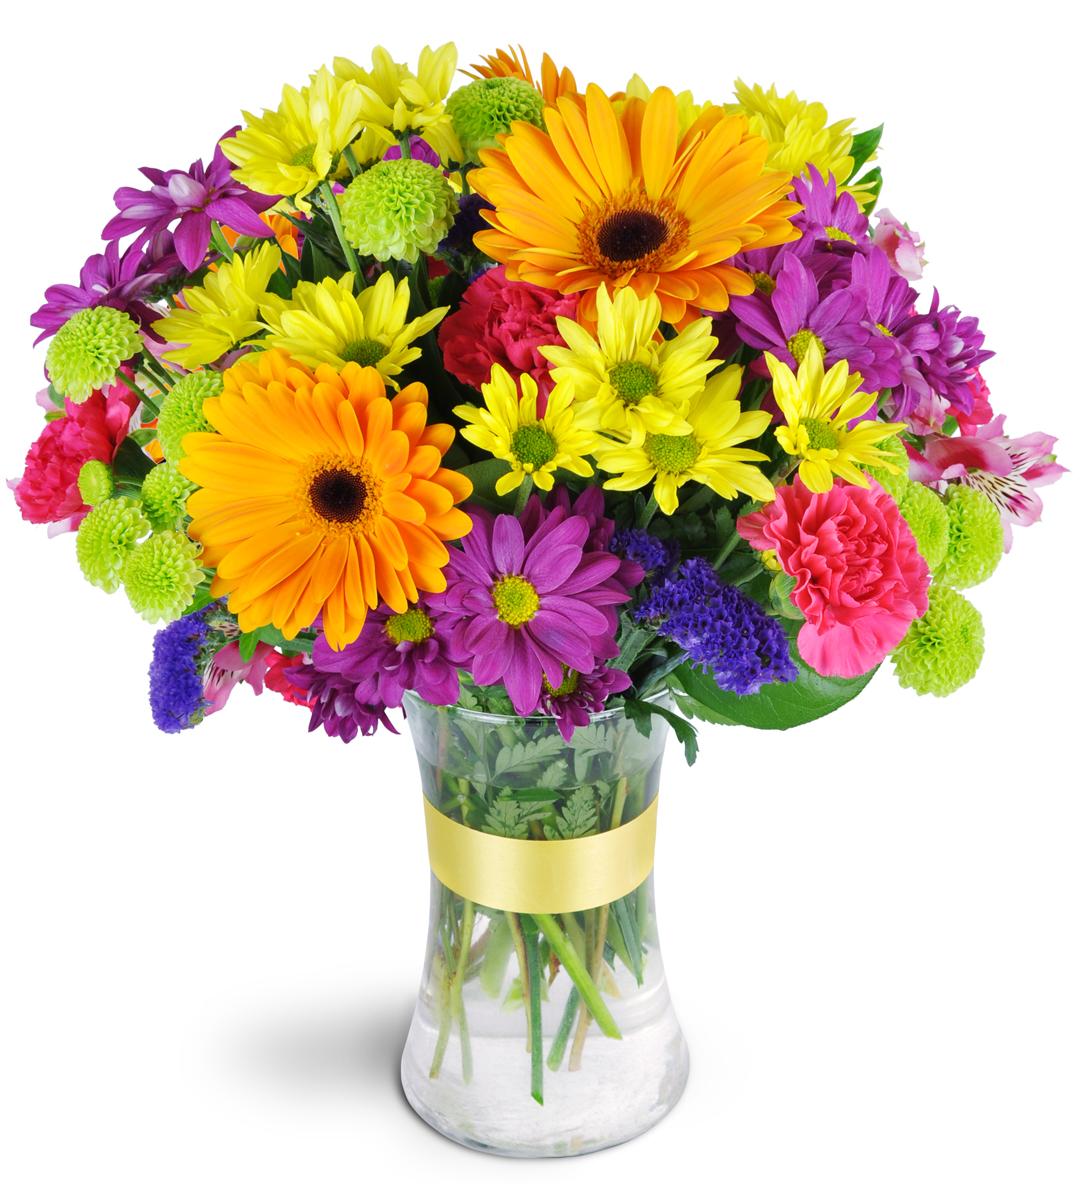 Radiant rainbow calgary ab florist izmirmasajfo